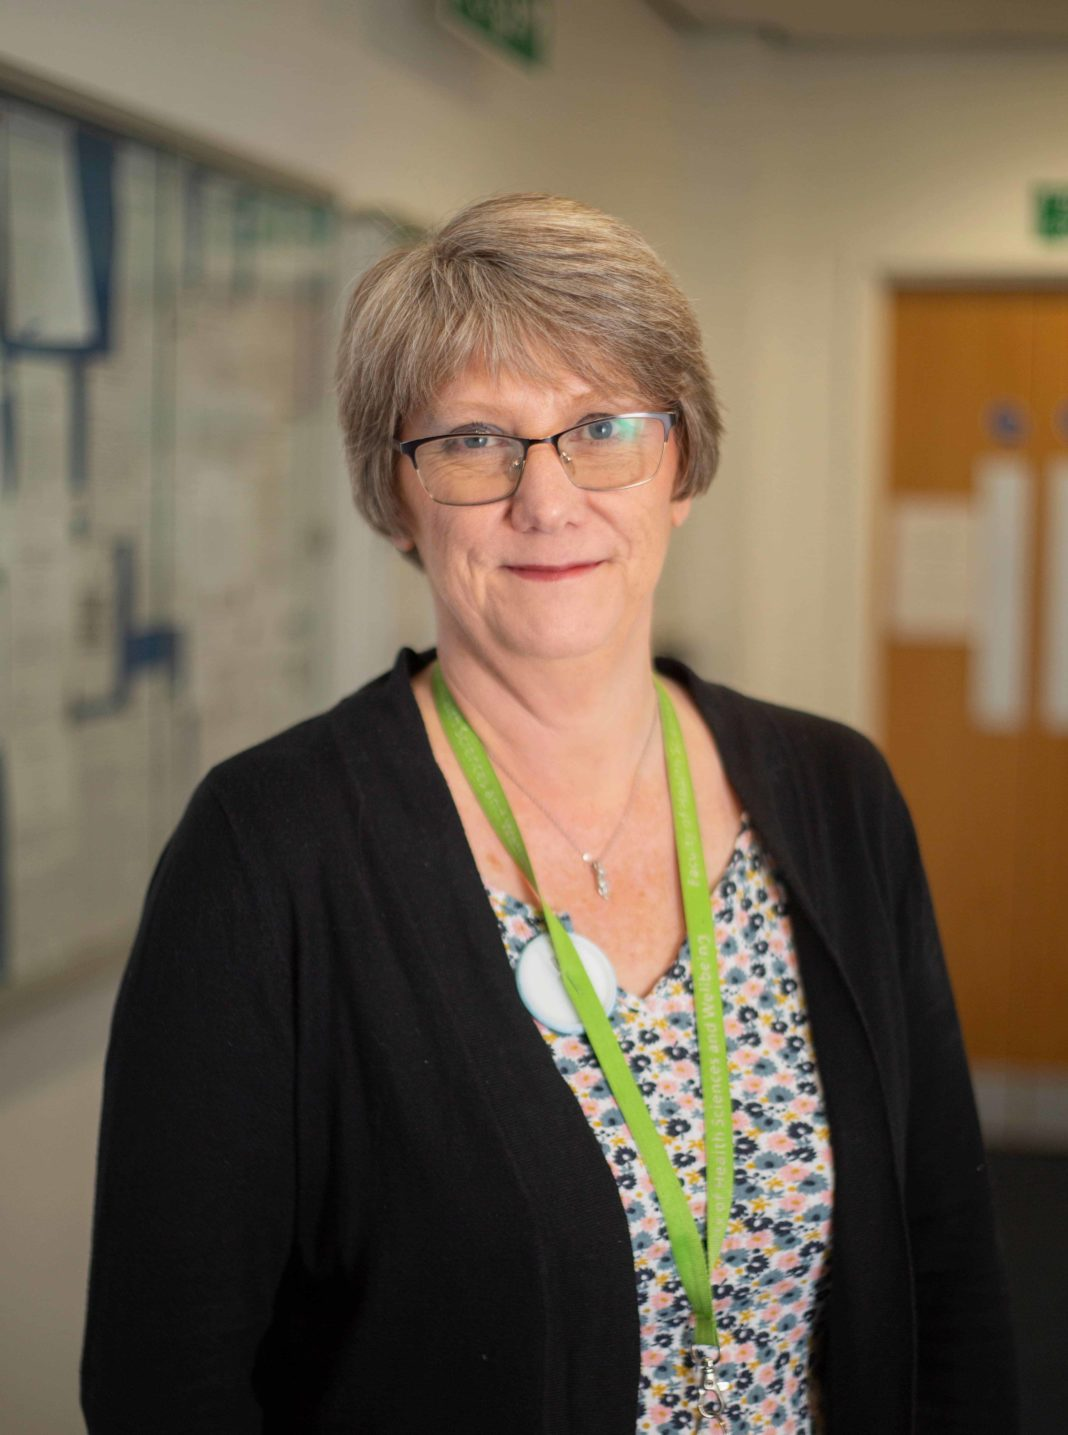 TOPIC Shortlisted For A Prestigious National Nursing Award